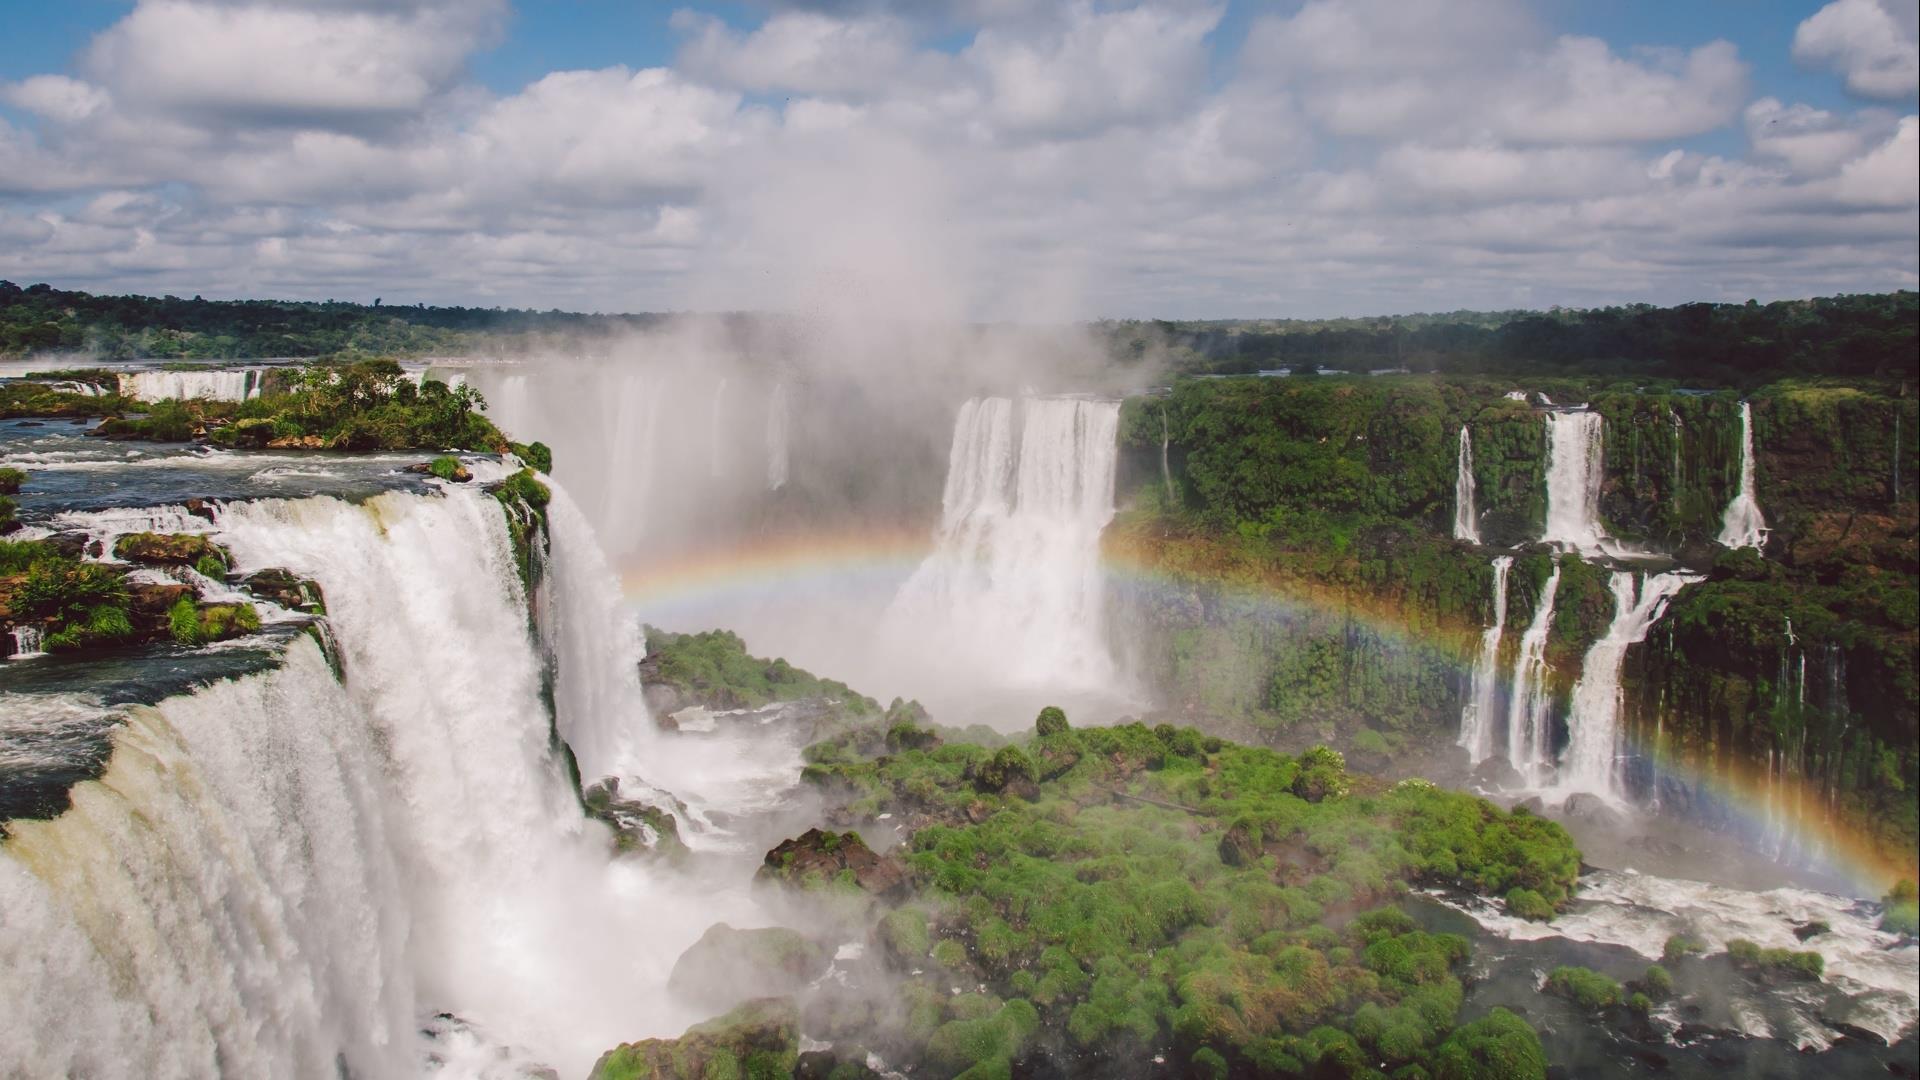 Brasilien Foz do Iguacu: 3 Tage Reisebaustein - Foz do Iguacu naturnah erleben